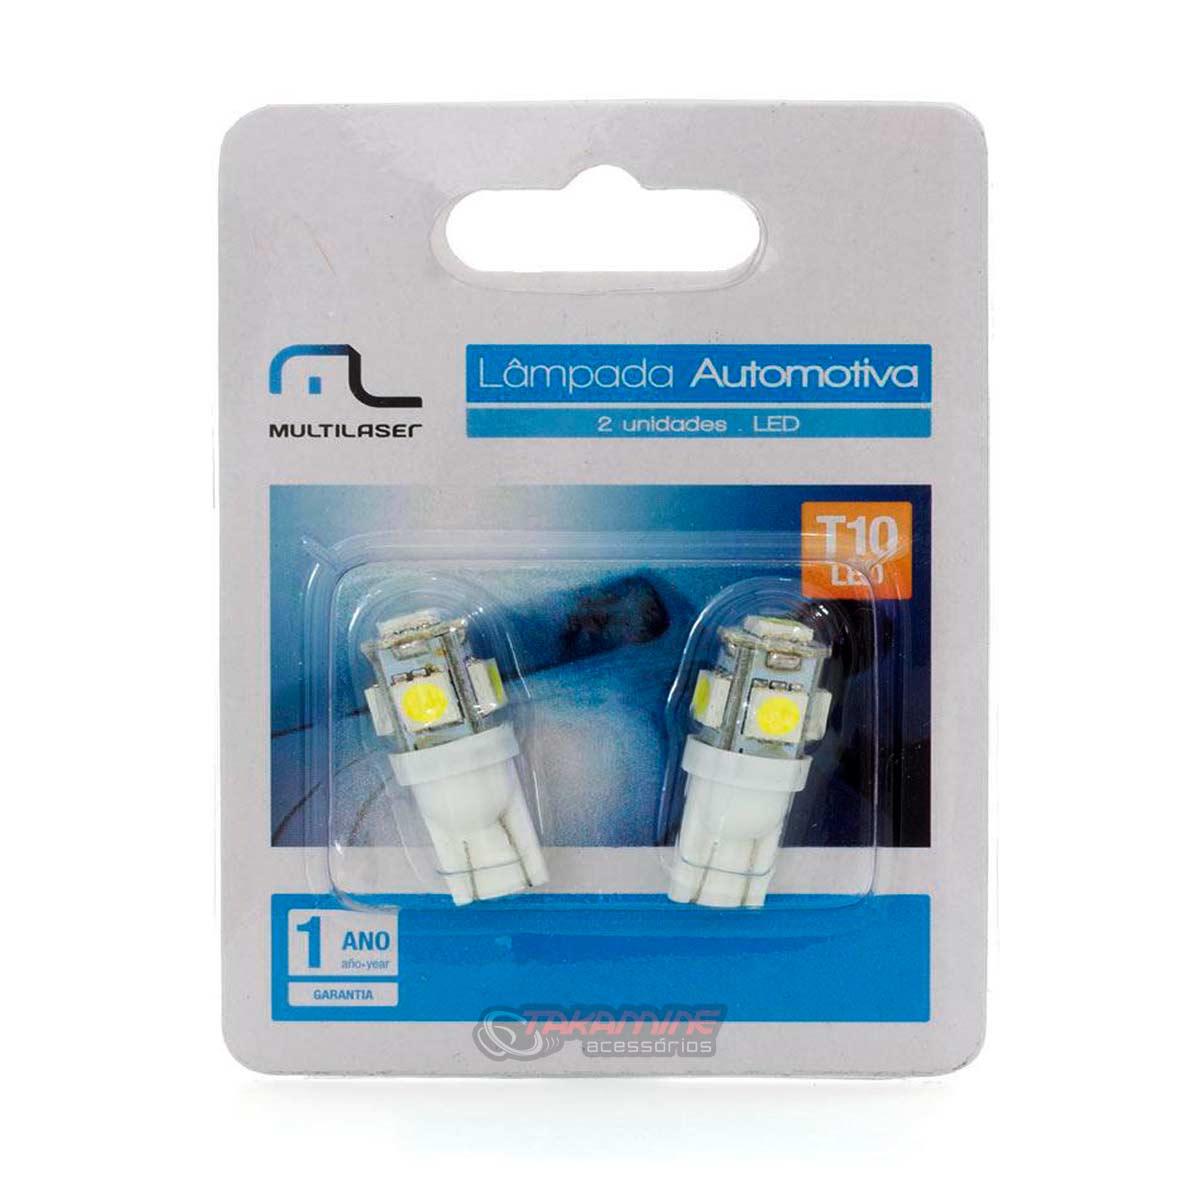 Lâmpada LED T10 Pingão super branca Multilaser AU818